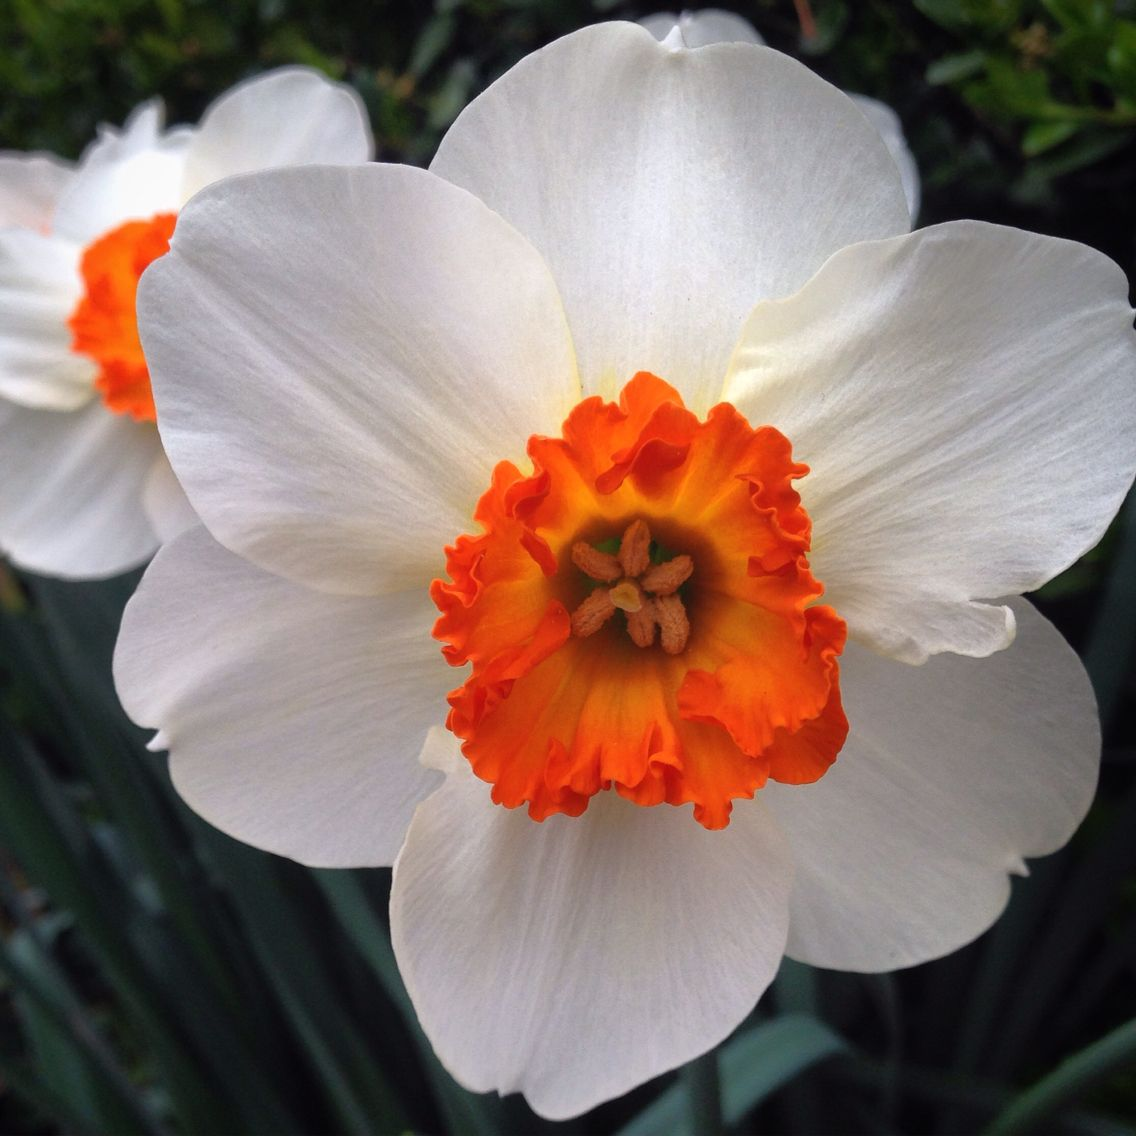 Daffodils first sign of spring flowers orange white elements daffodils first sign of spring flowers orange white mightylinksfo